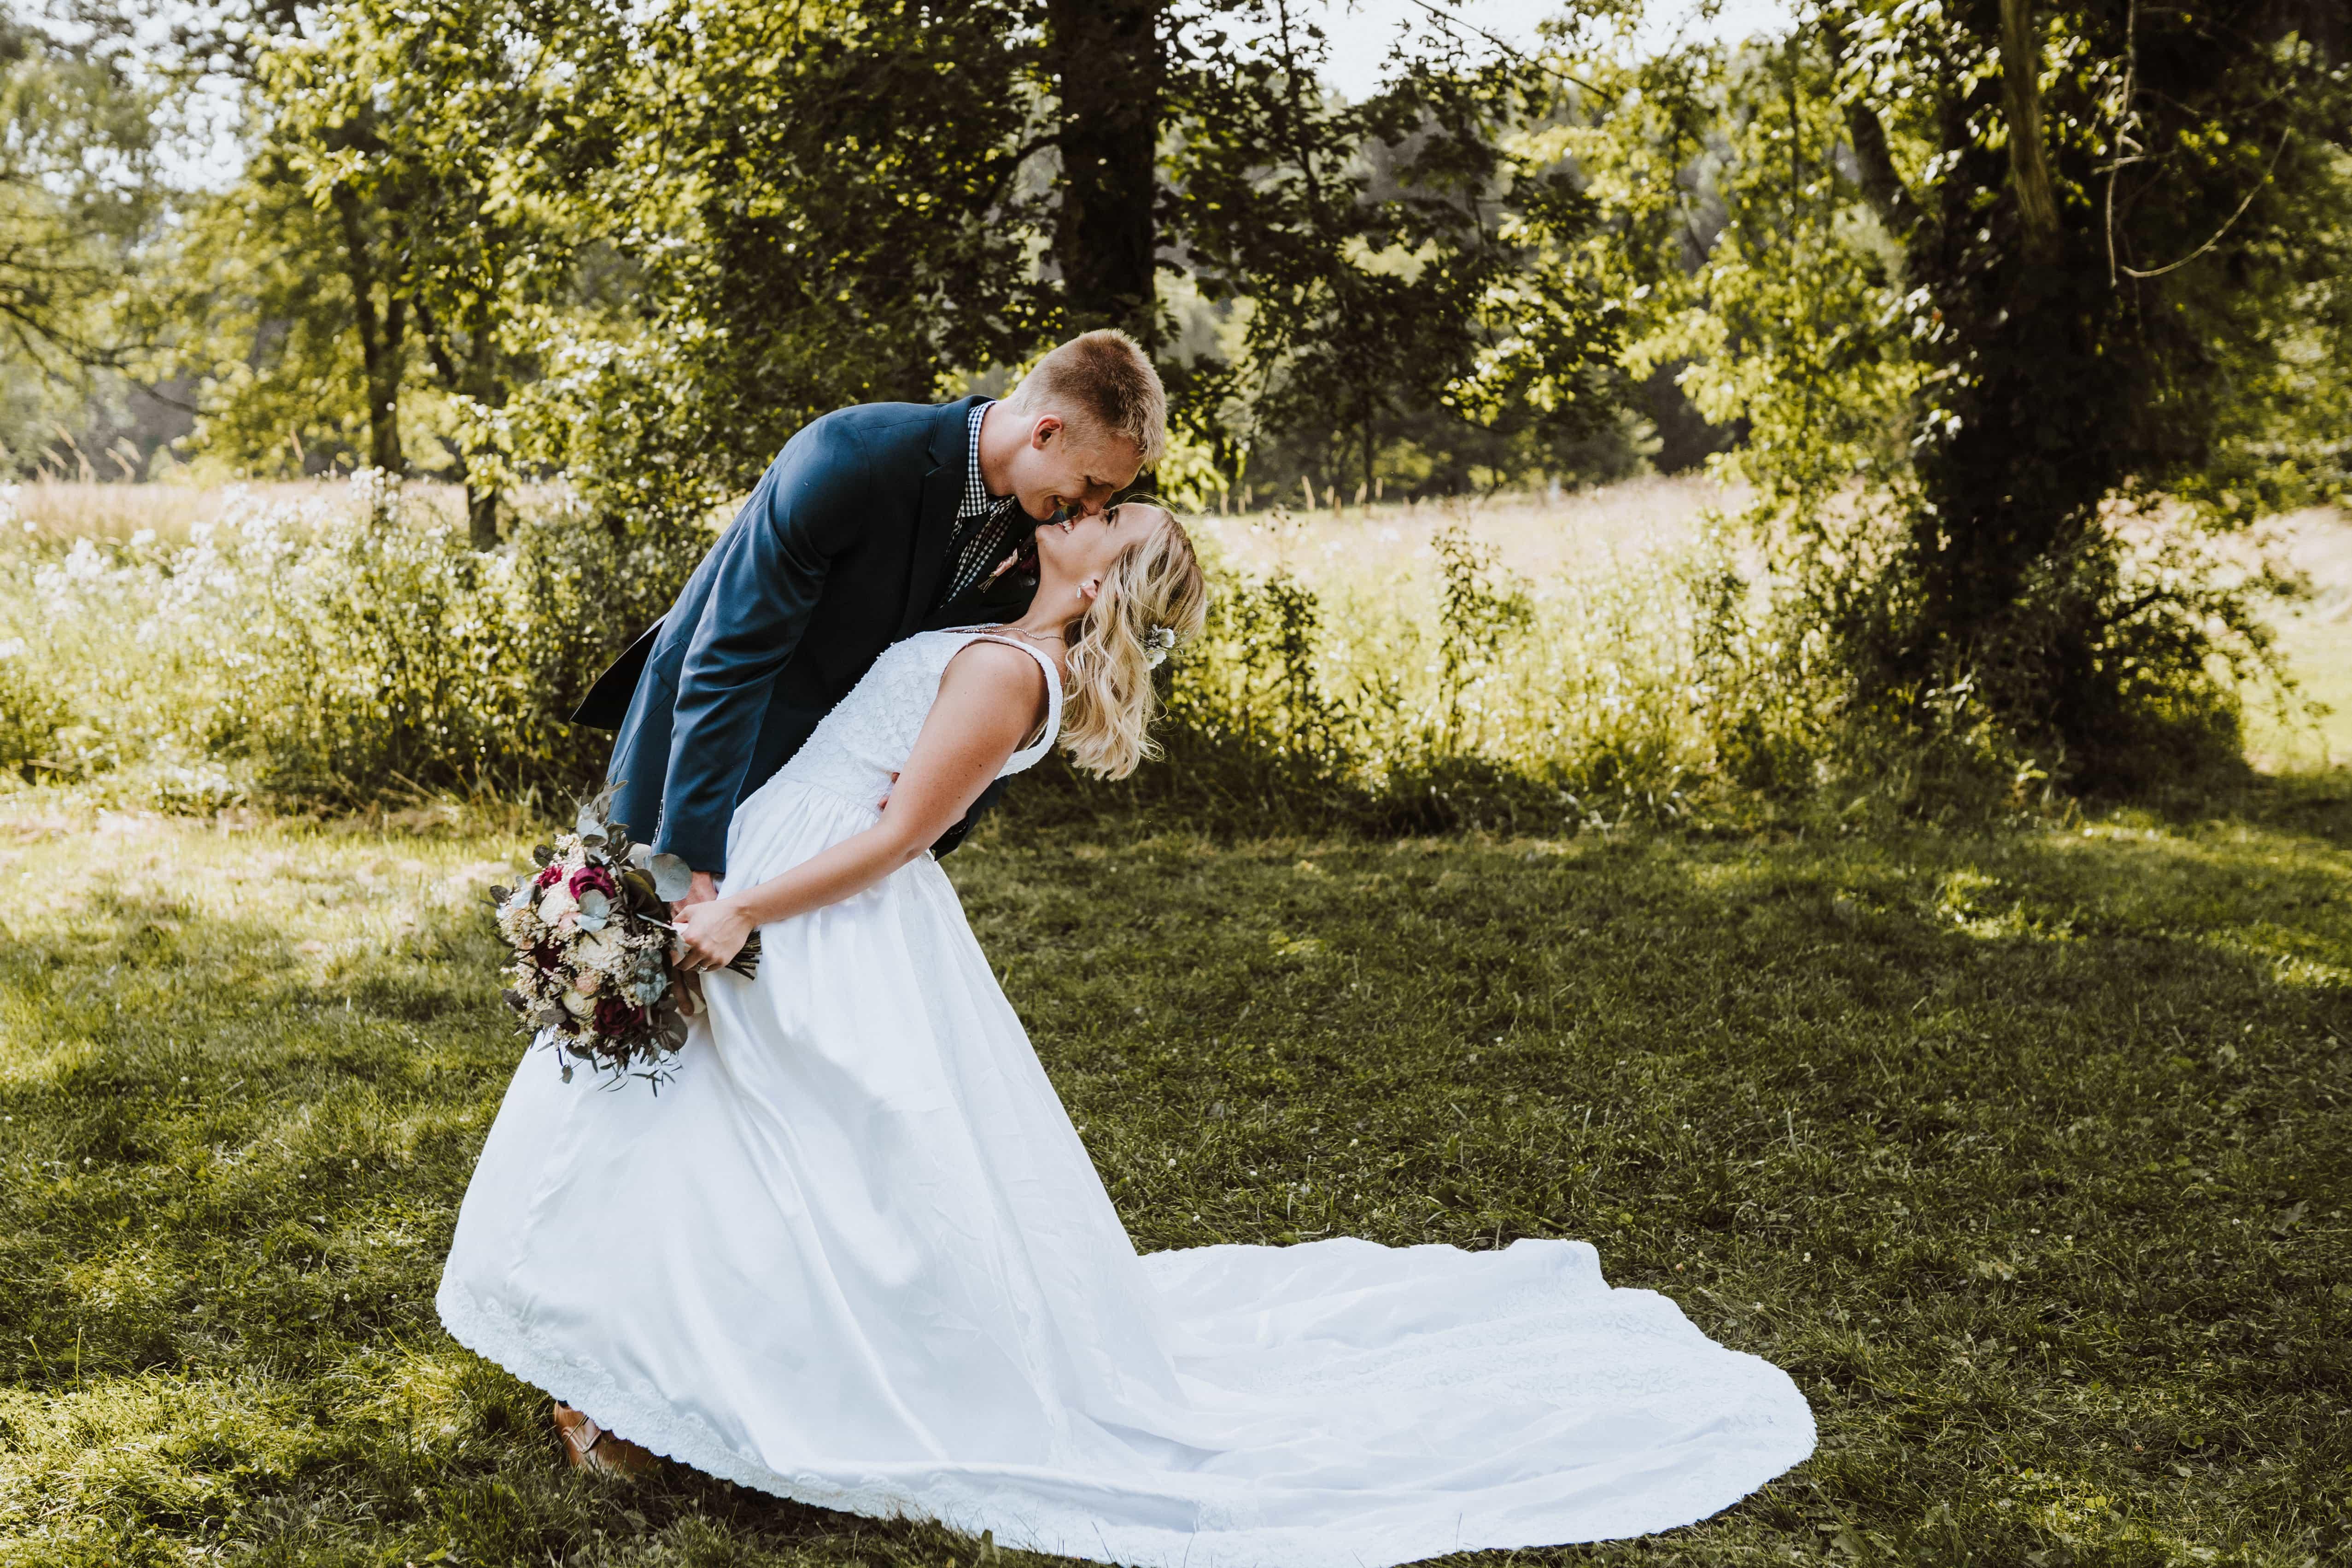 Adrian Michigan Wedding Photographer | Kristin and Noah